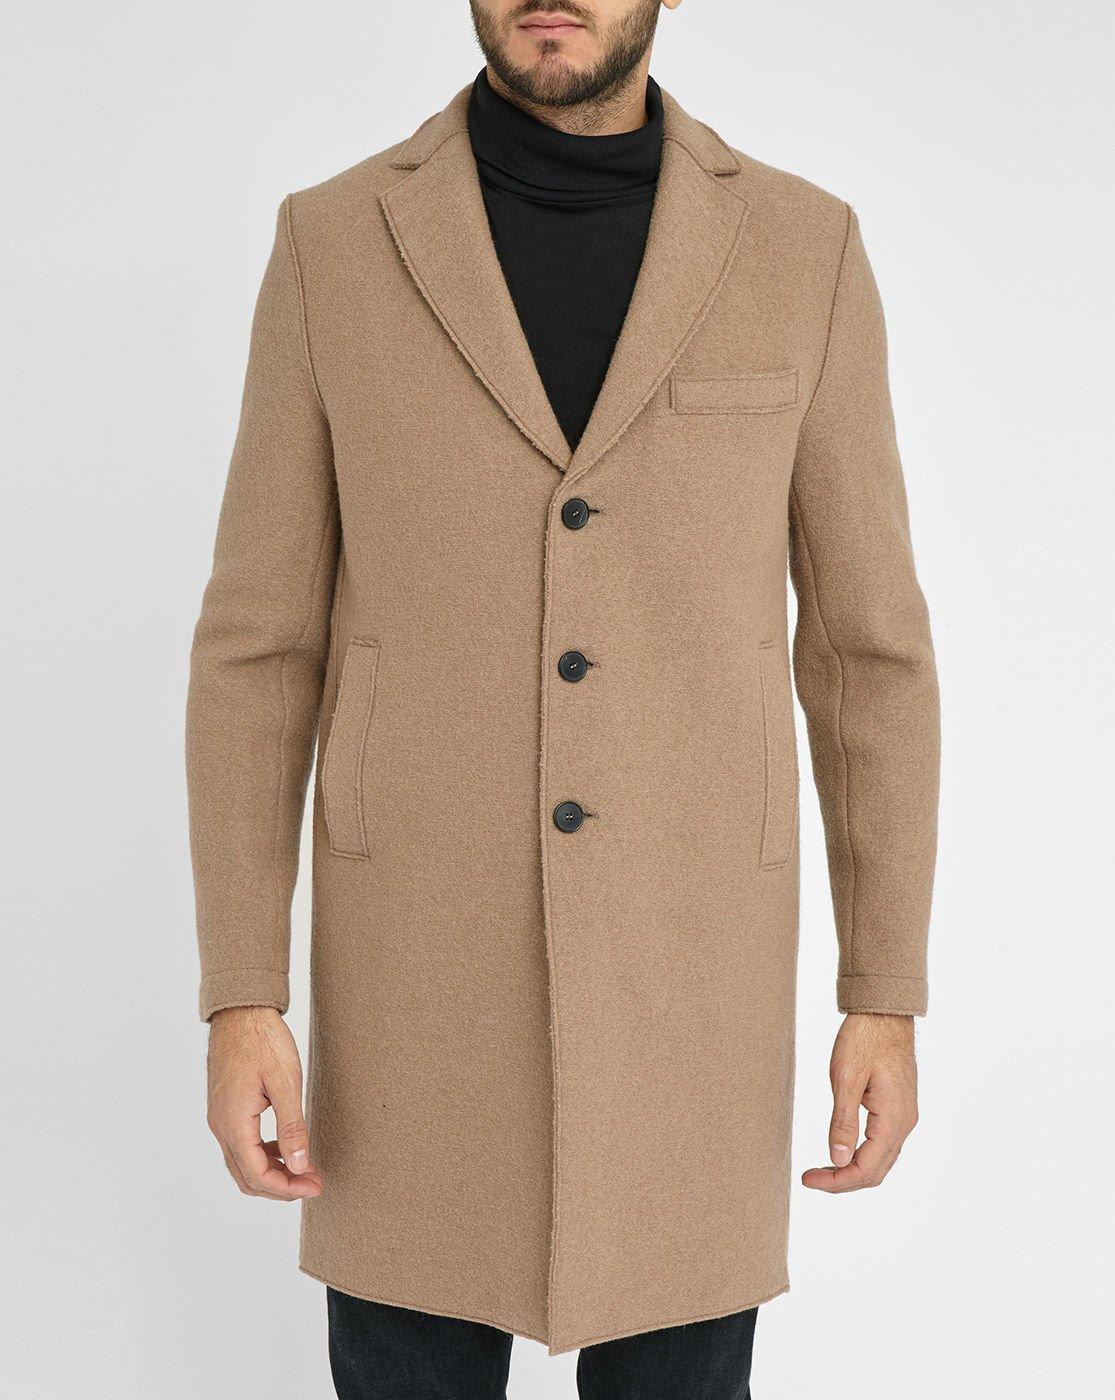 Unlined Wool Coat - Coat Nj